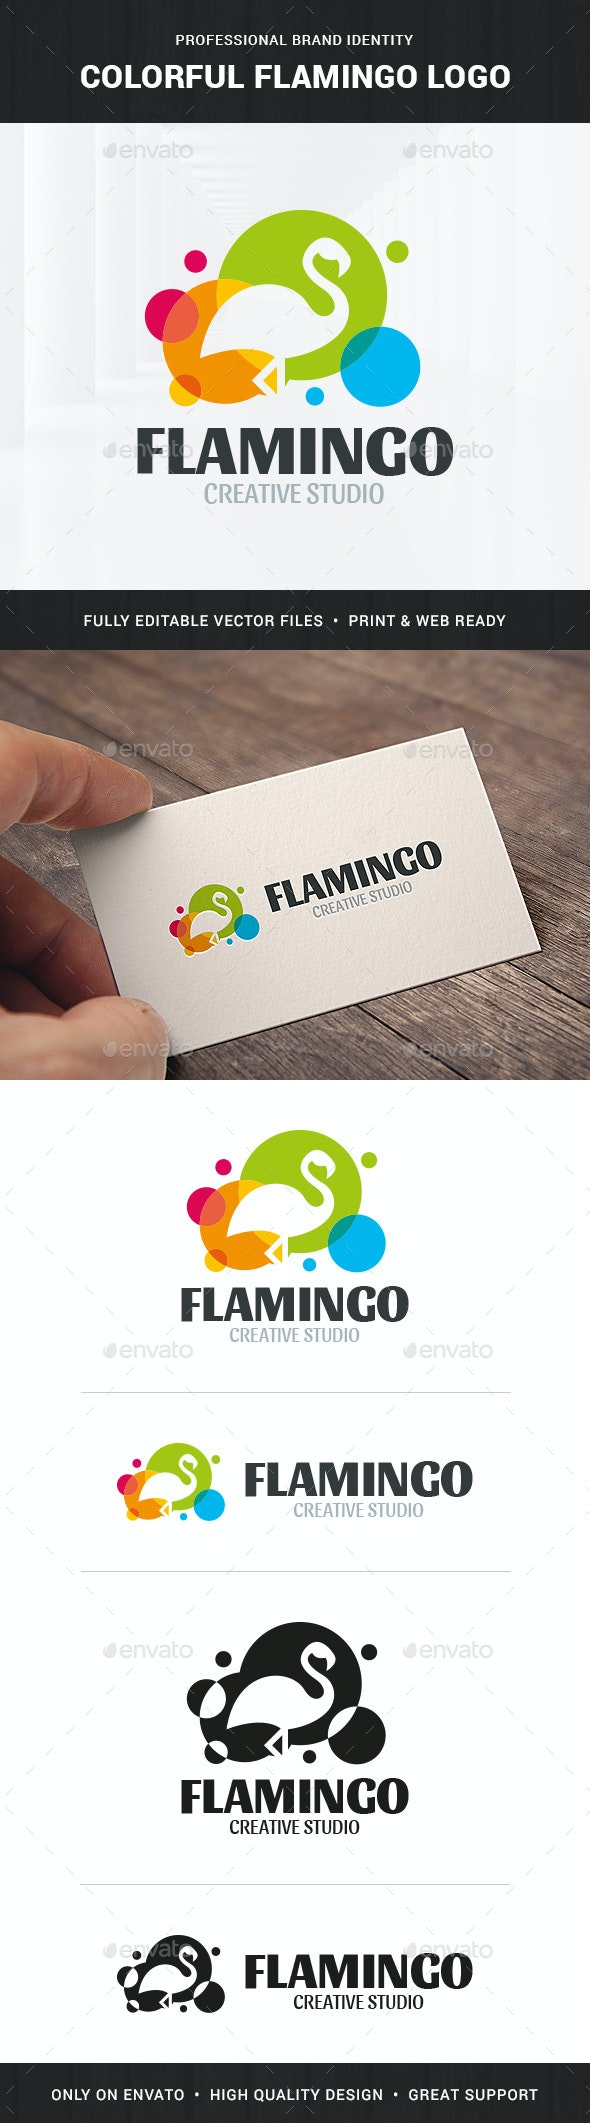 Colorful Flamingo Logo Template - Animals Logo Templates